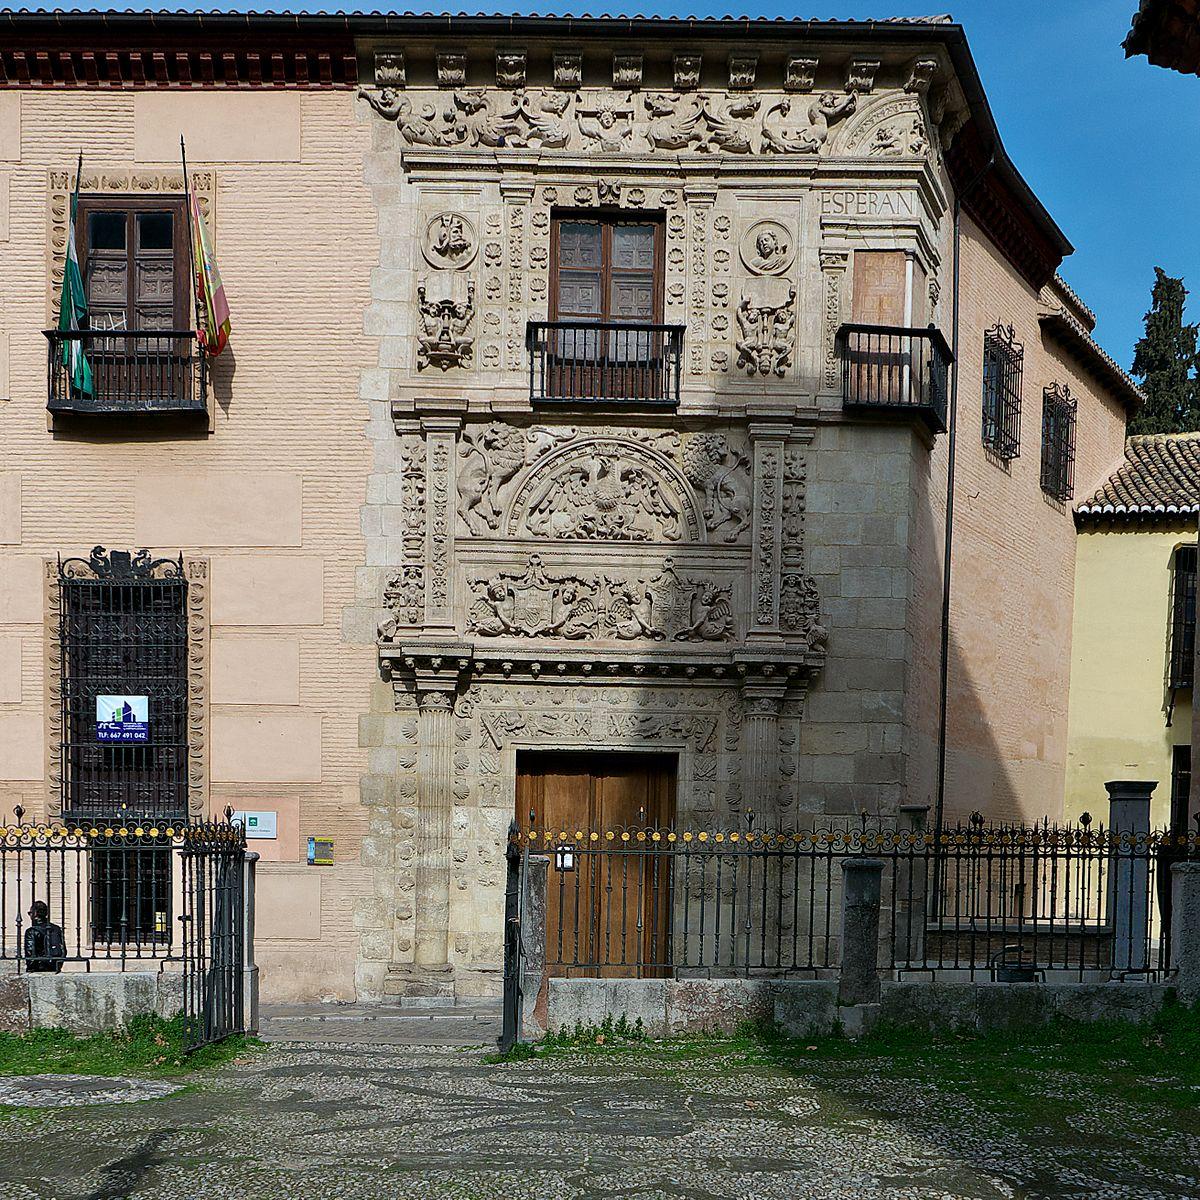 Hernando de zafra wikipedia la enciclopedia libre for Casas modernas granada